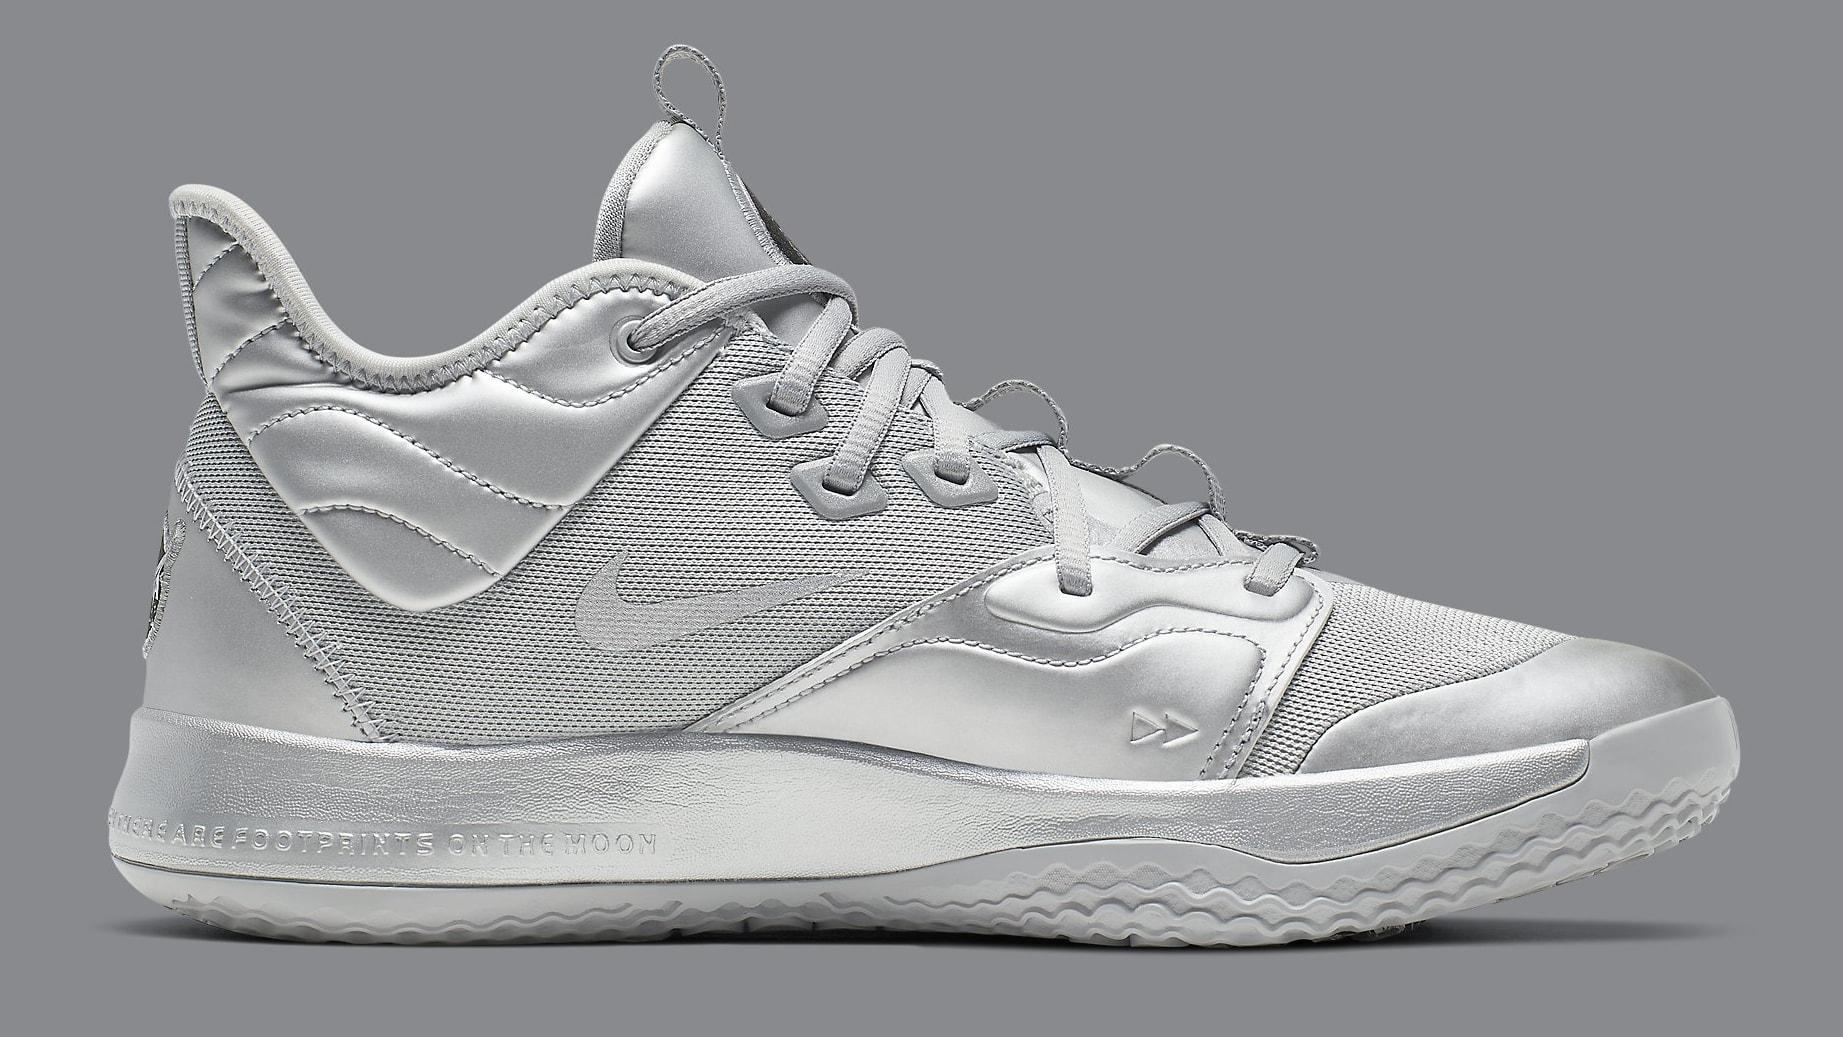 Nike PG 3 NASA Silver Release Date CI2666-001 Medial